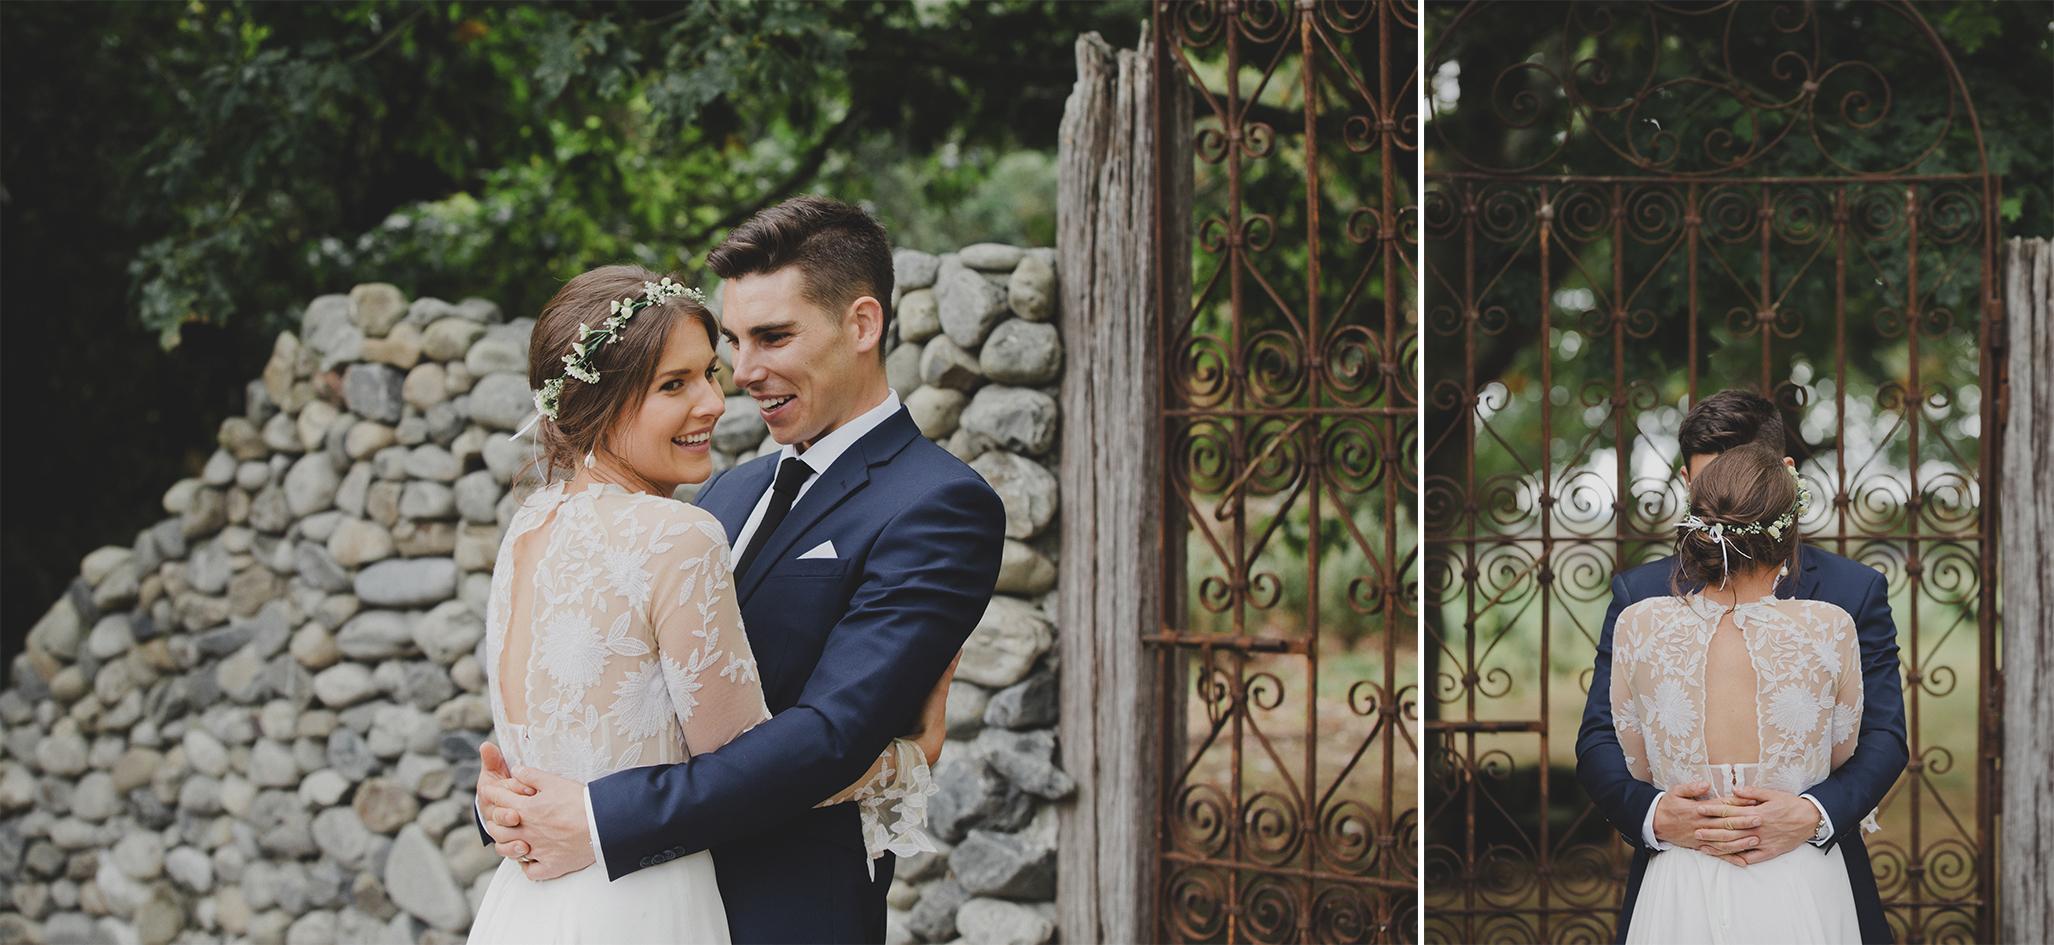 wellington wedding photography NZ - 1058.JPG